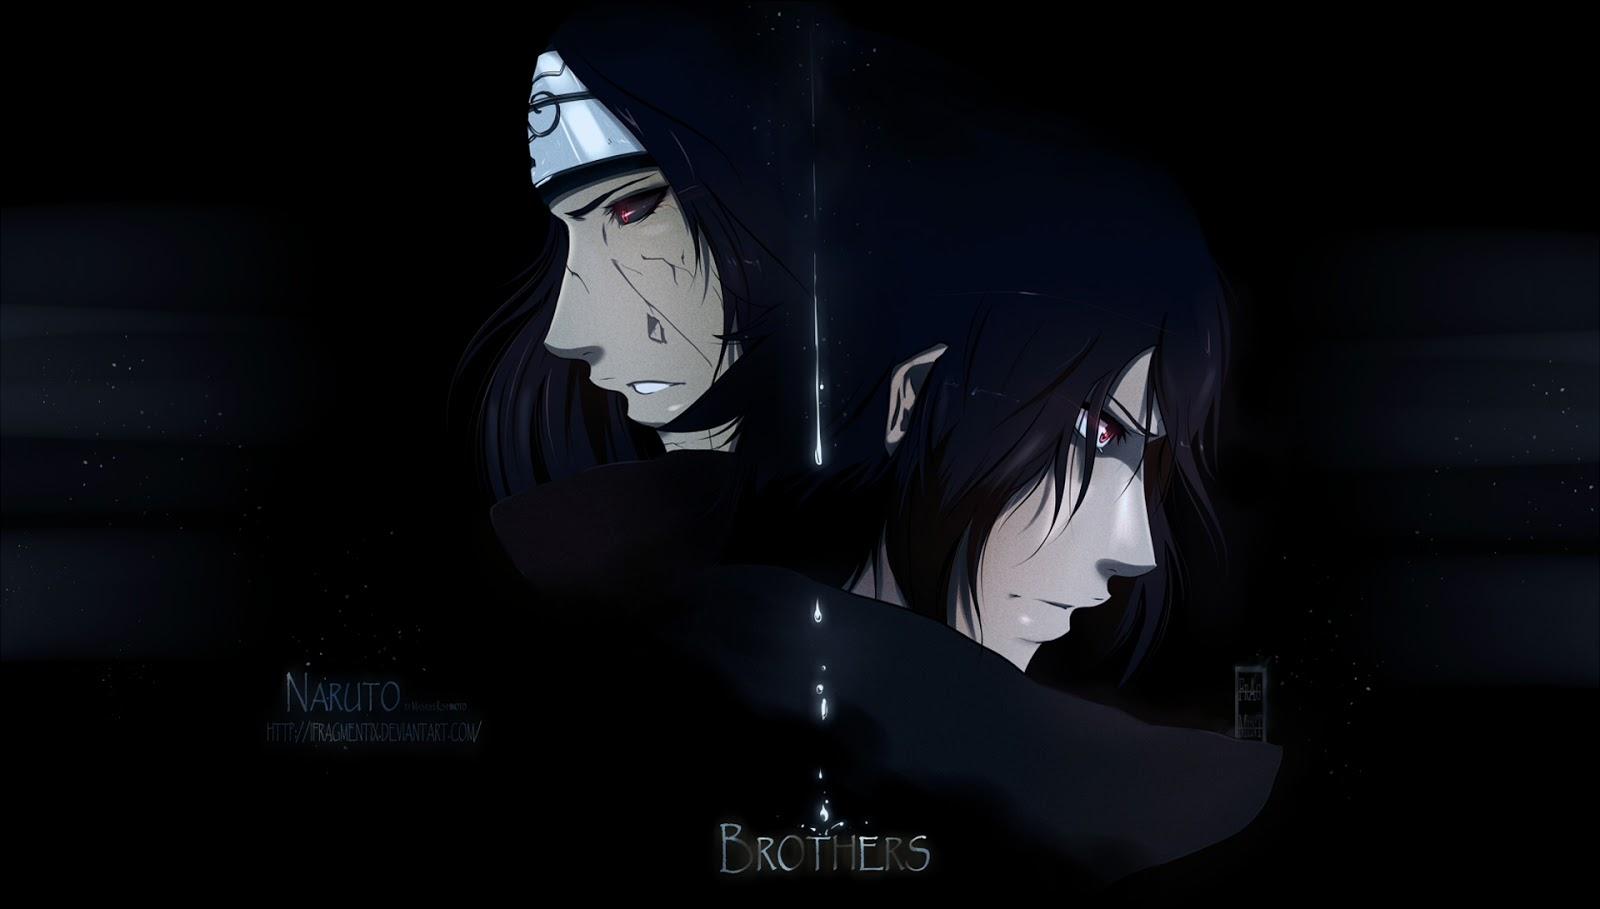 Uchiha Sasuke Itachi brothers ifragmentix deviant art anime hd 1600x909